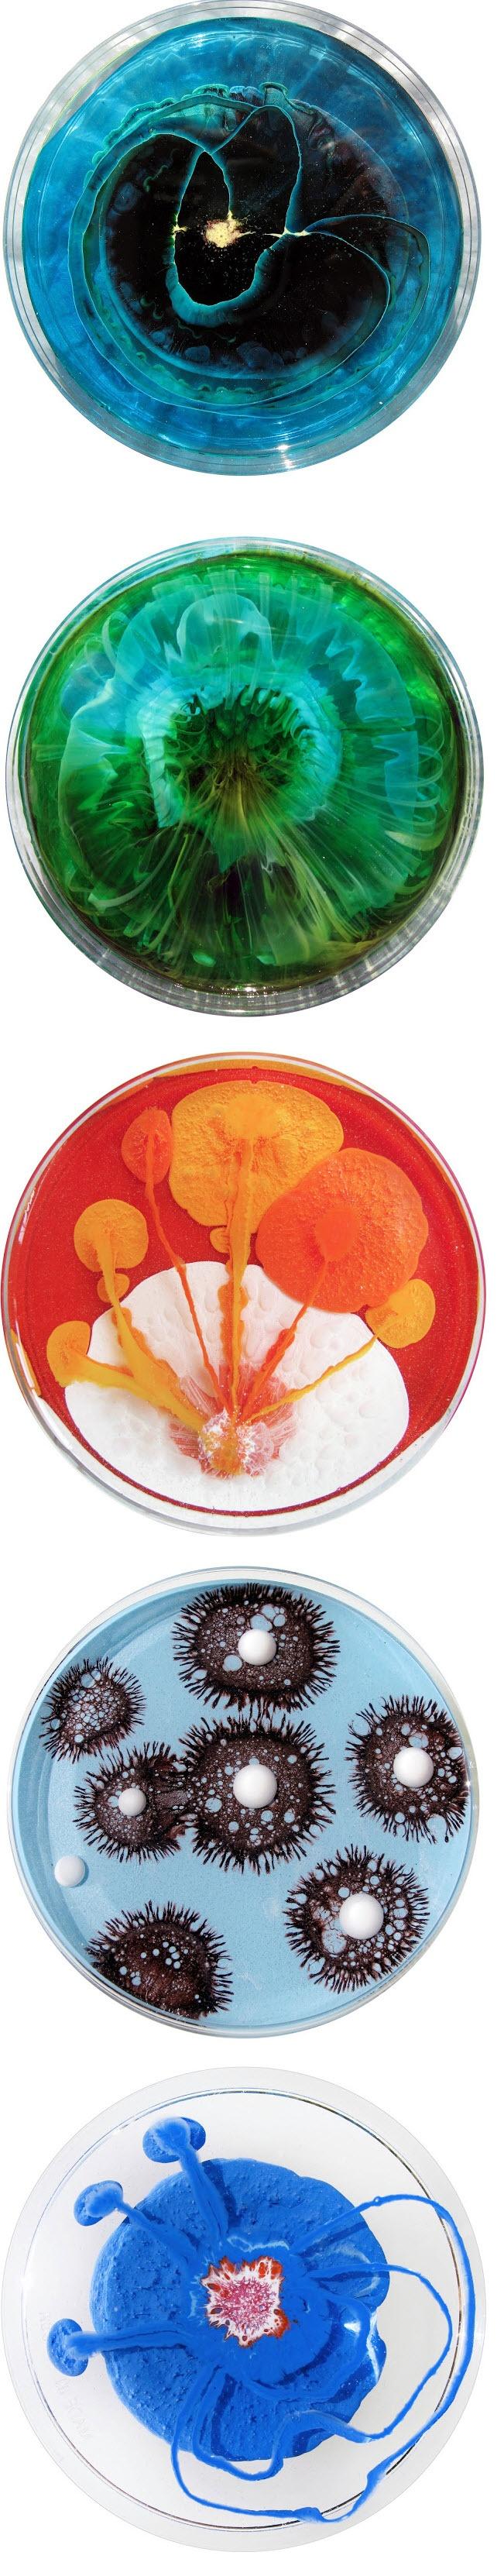 Klari Reis – Abstract paintings in Petri dishes